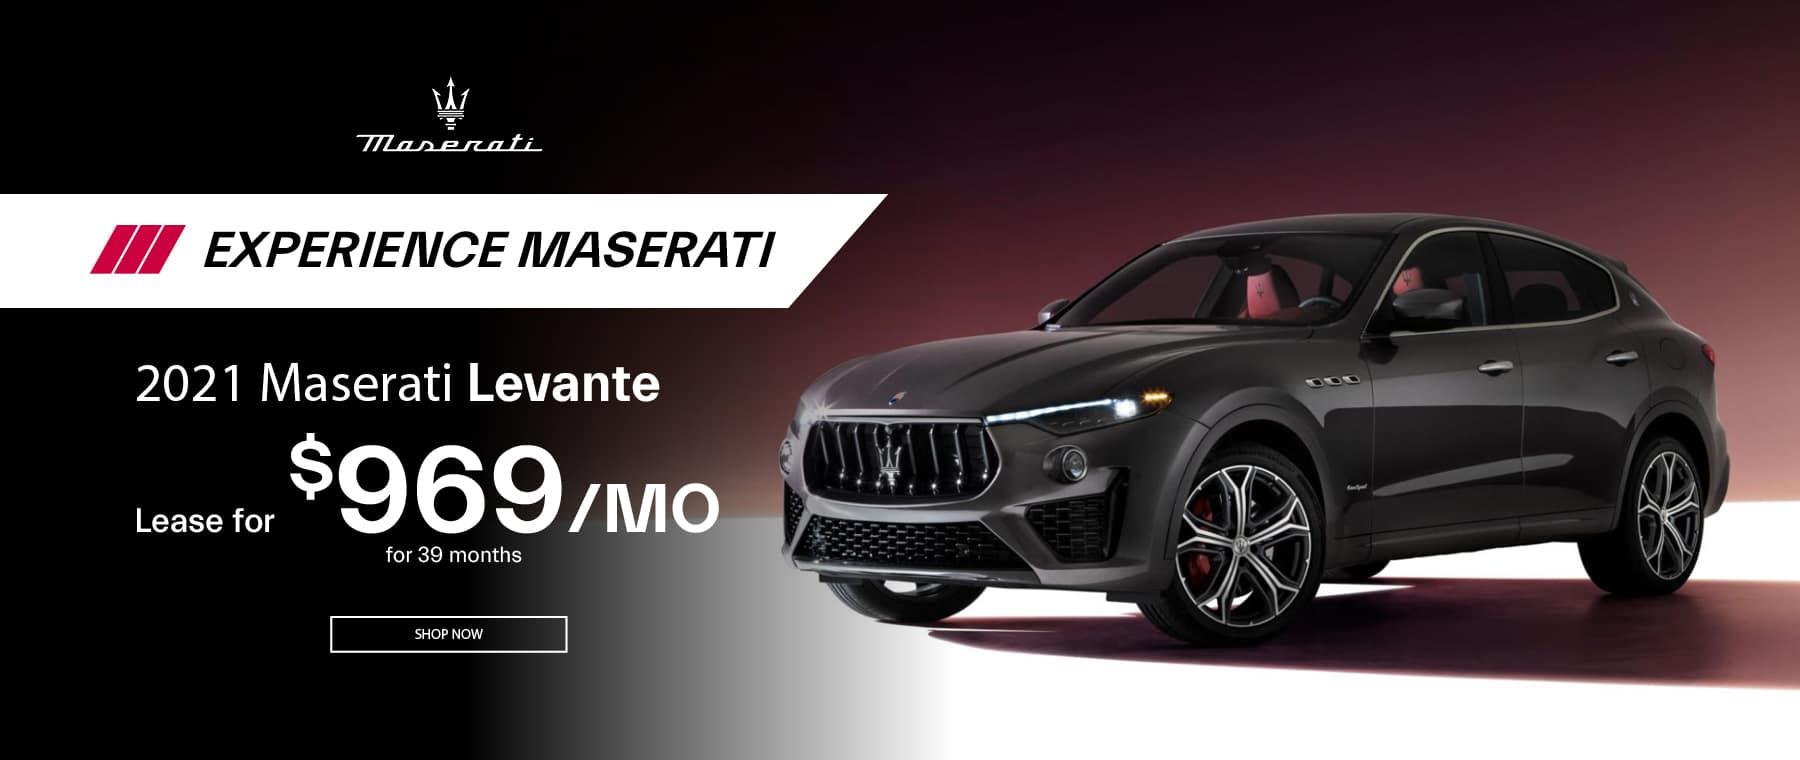 Dafrk grey 2021 Maserati Levante special offer